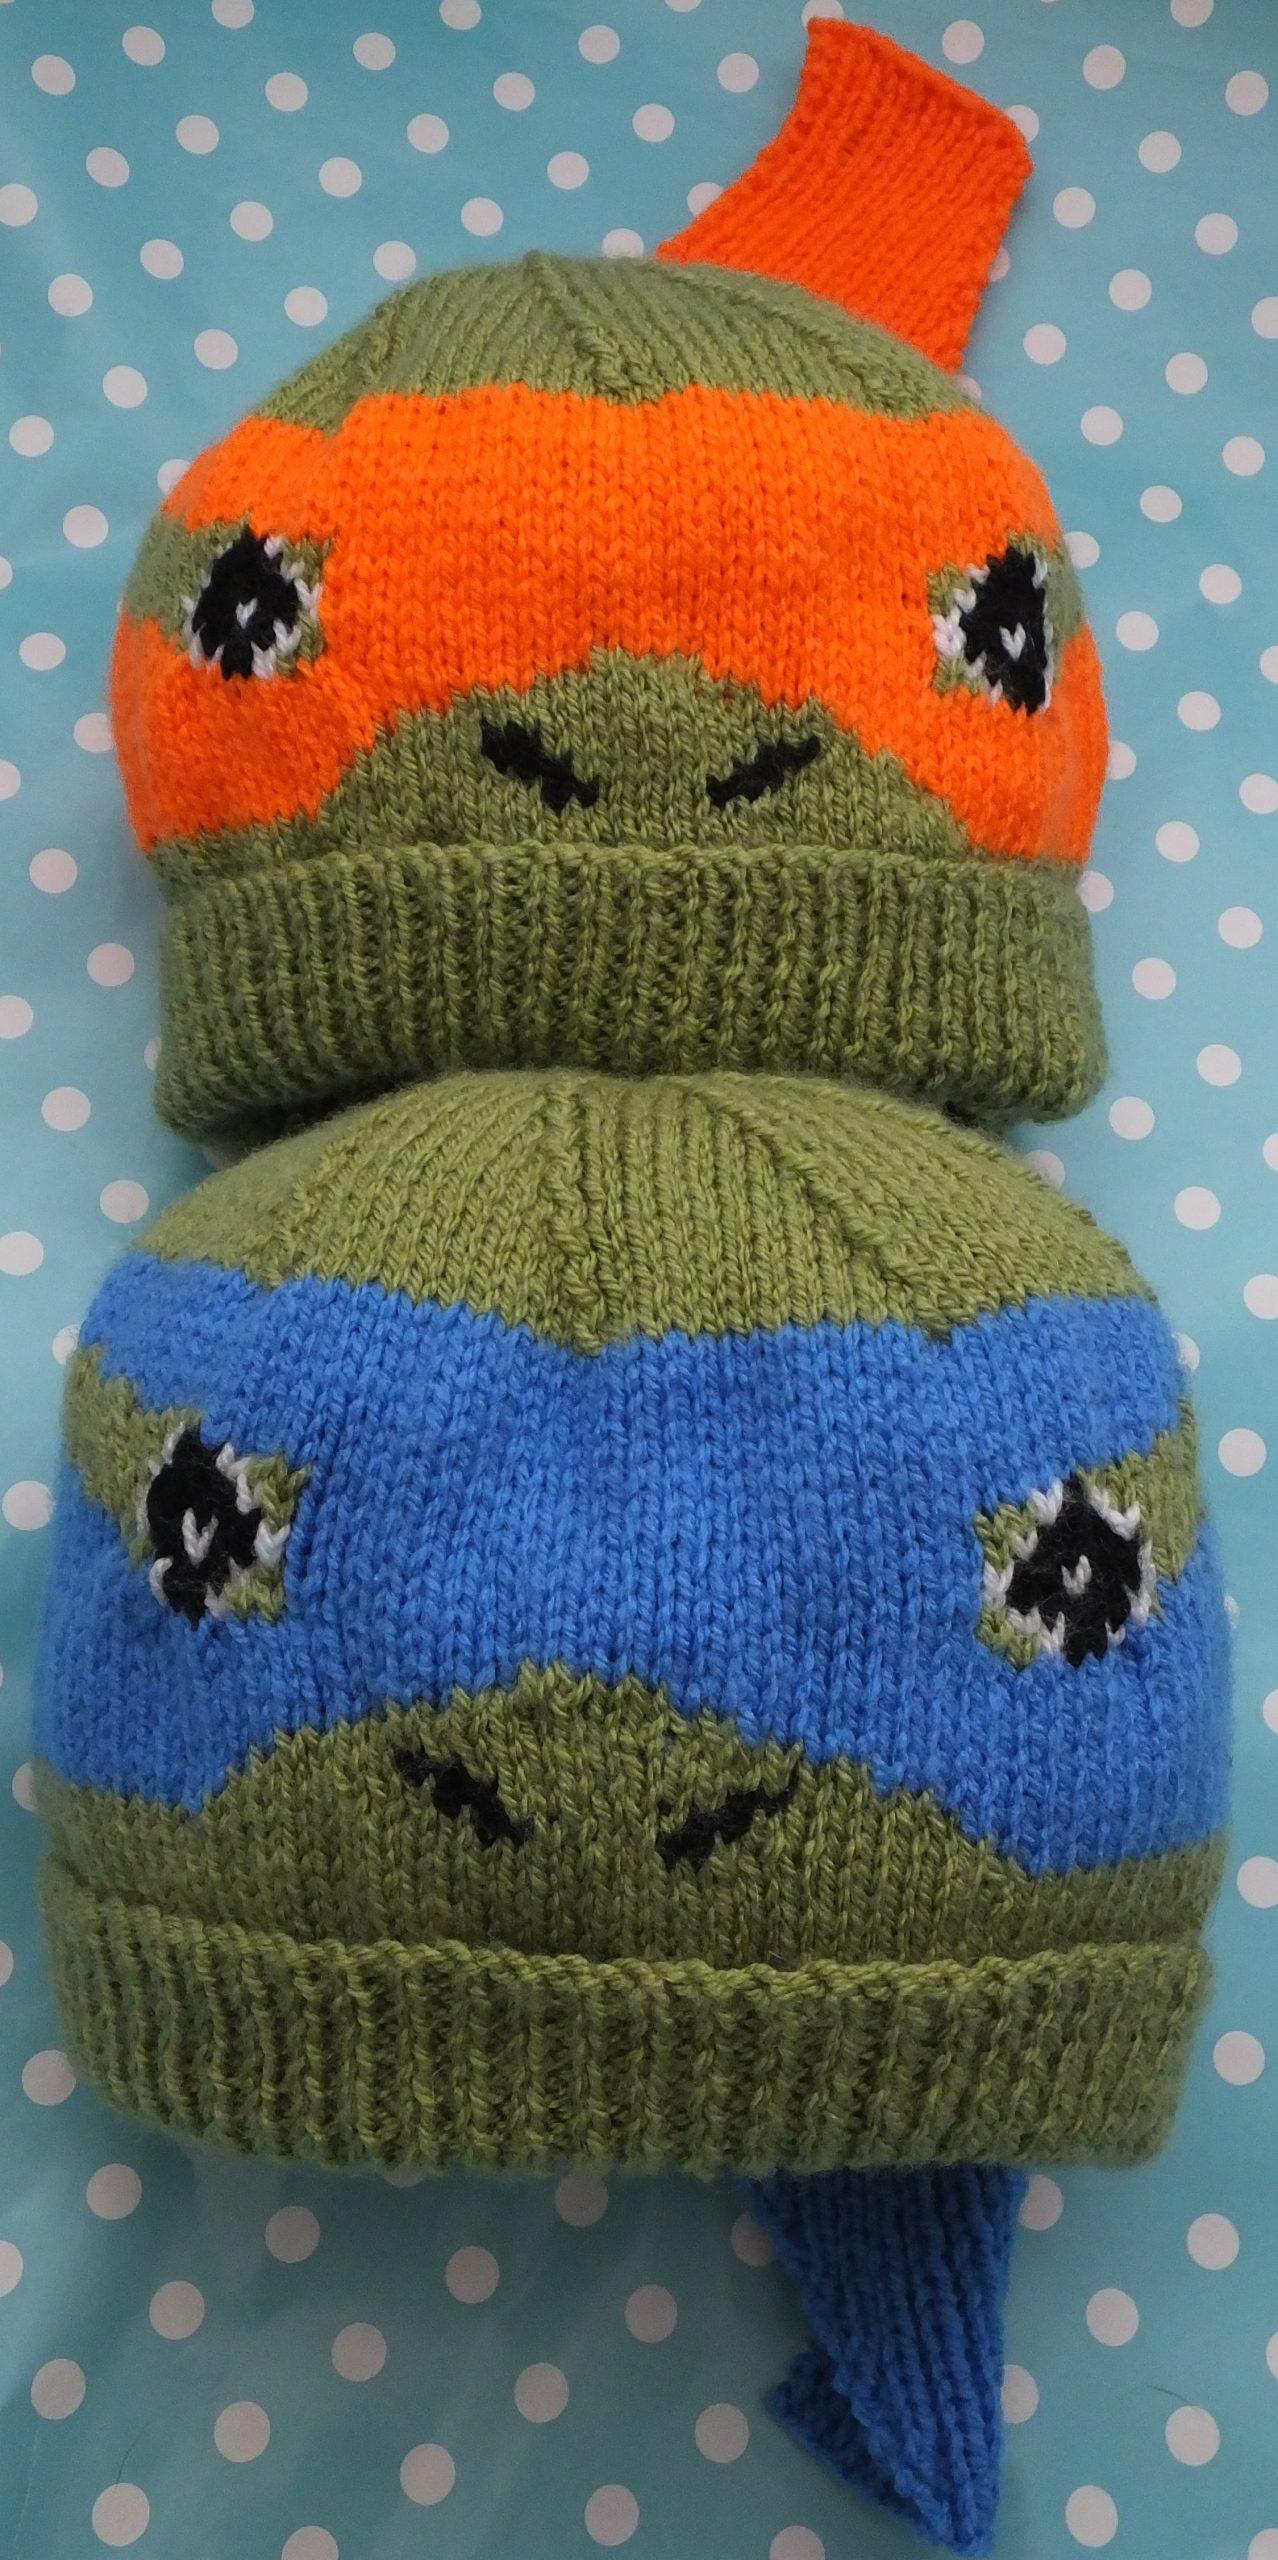 DK - Knitting pattern - Turtle Beanie Hat | Knits r us